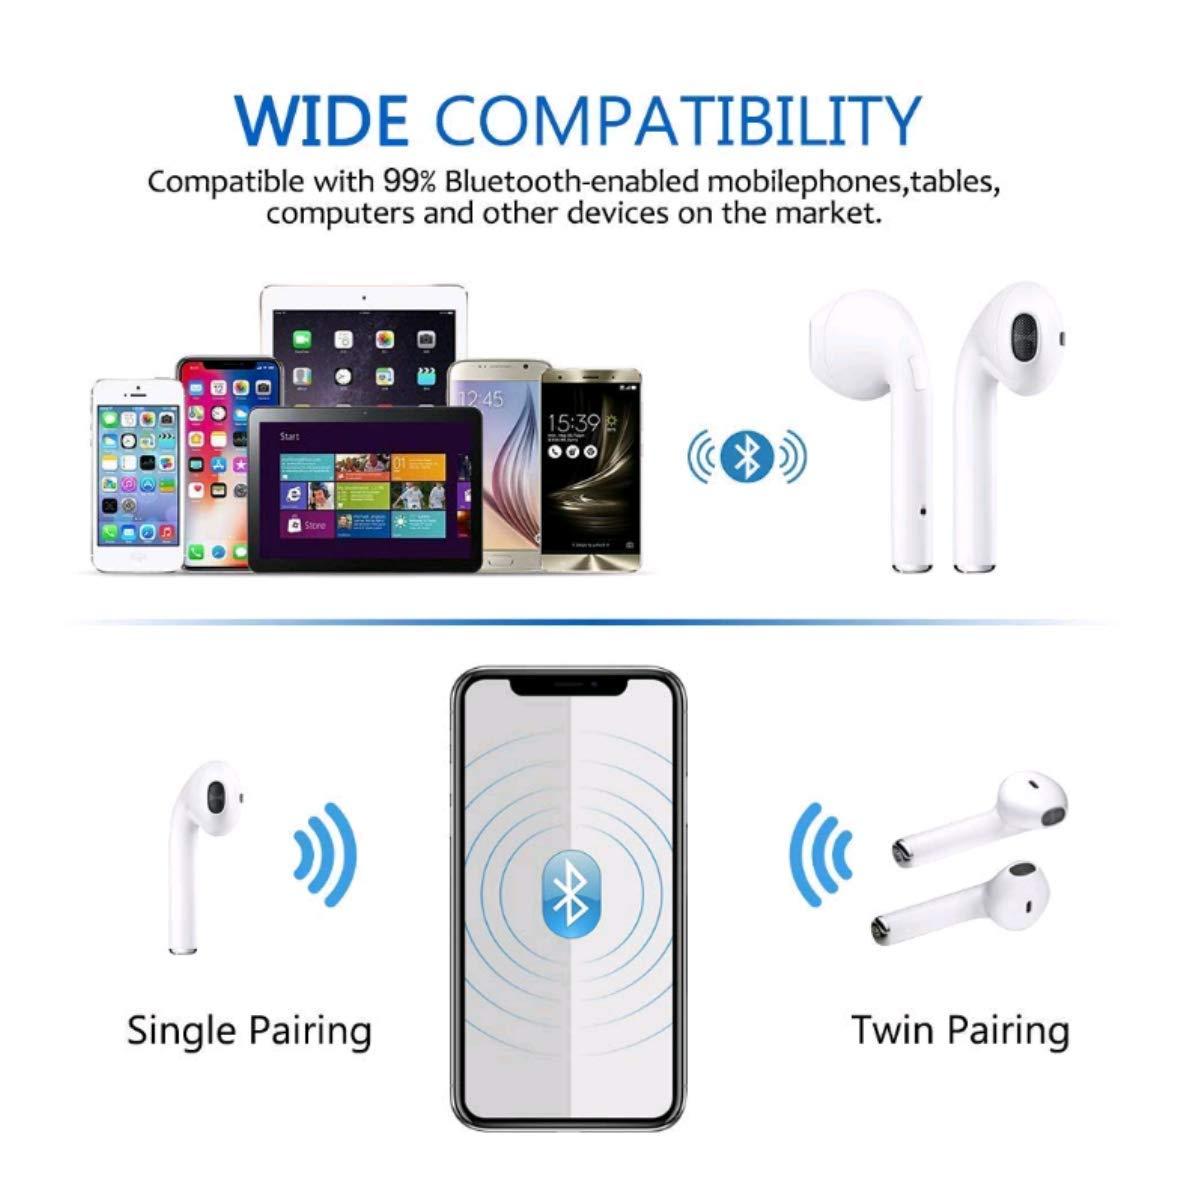 Auriculares Bluetooth V5.0, Inalámbricos Bluetooth I8X-TWS Auriculares Sin Cable Deporte con Estuche de Carga Portátil para Huawei Honor Nokia MI Samsung ...